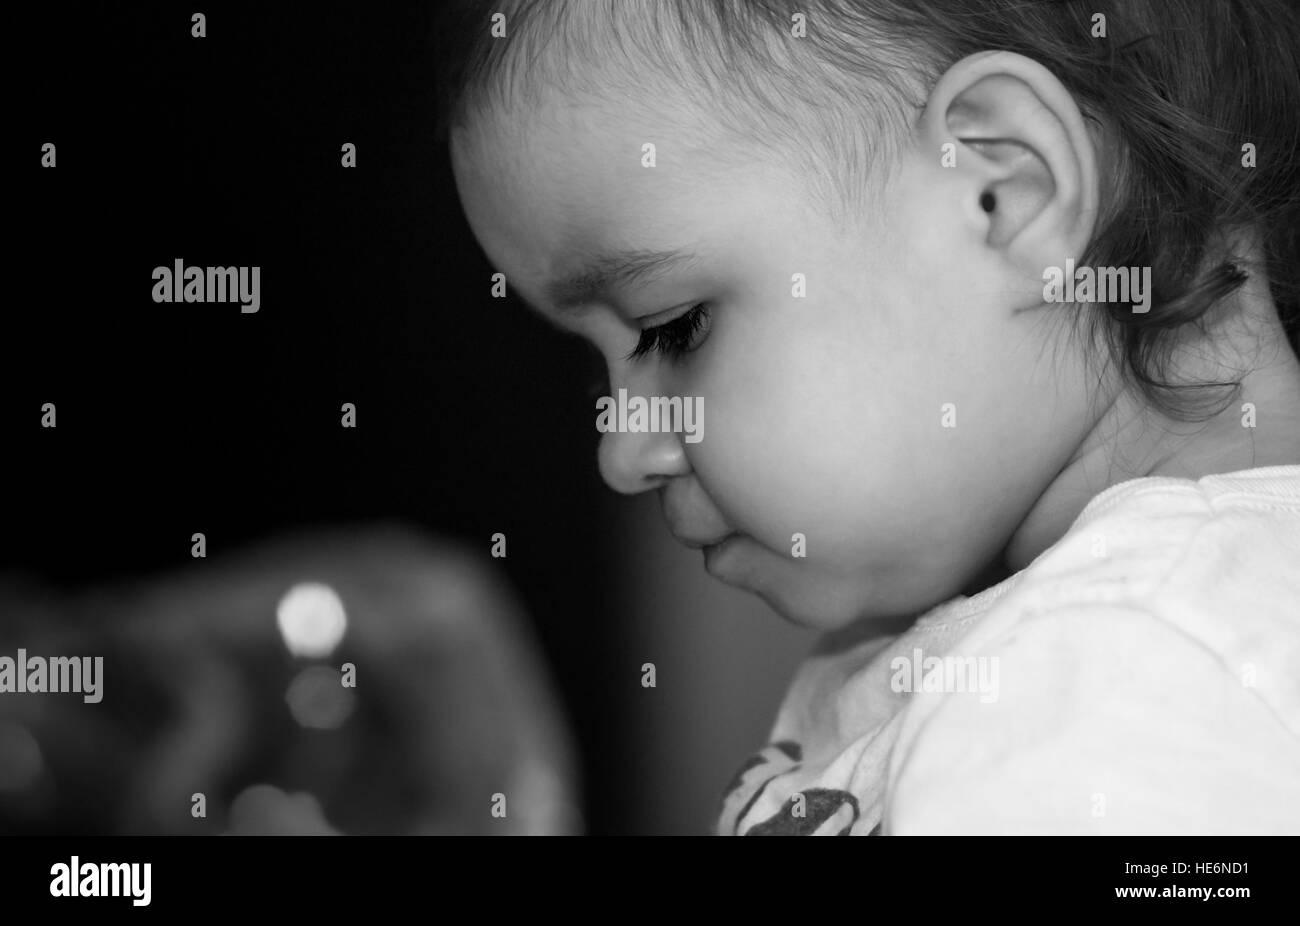 Profile face of cute little girl - Stock Image